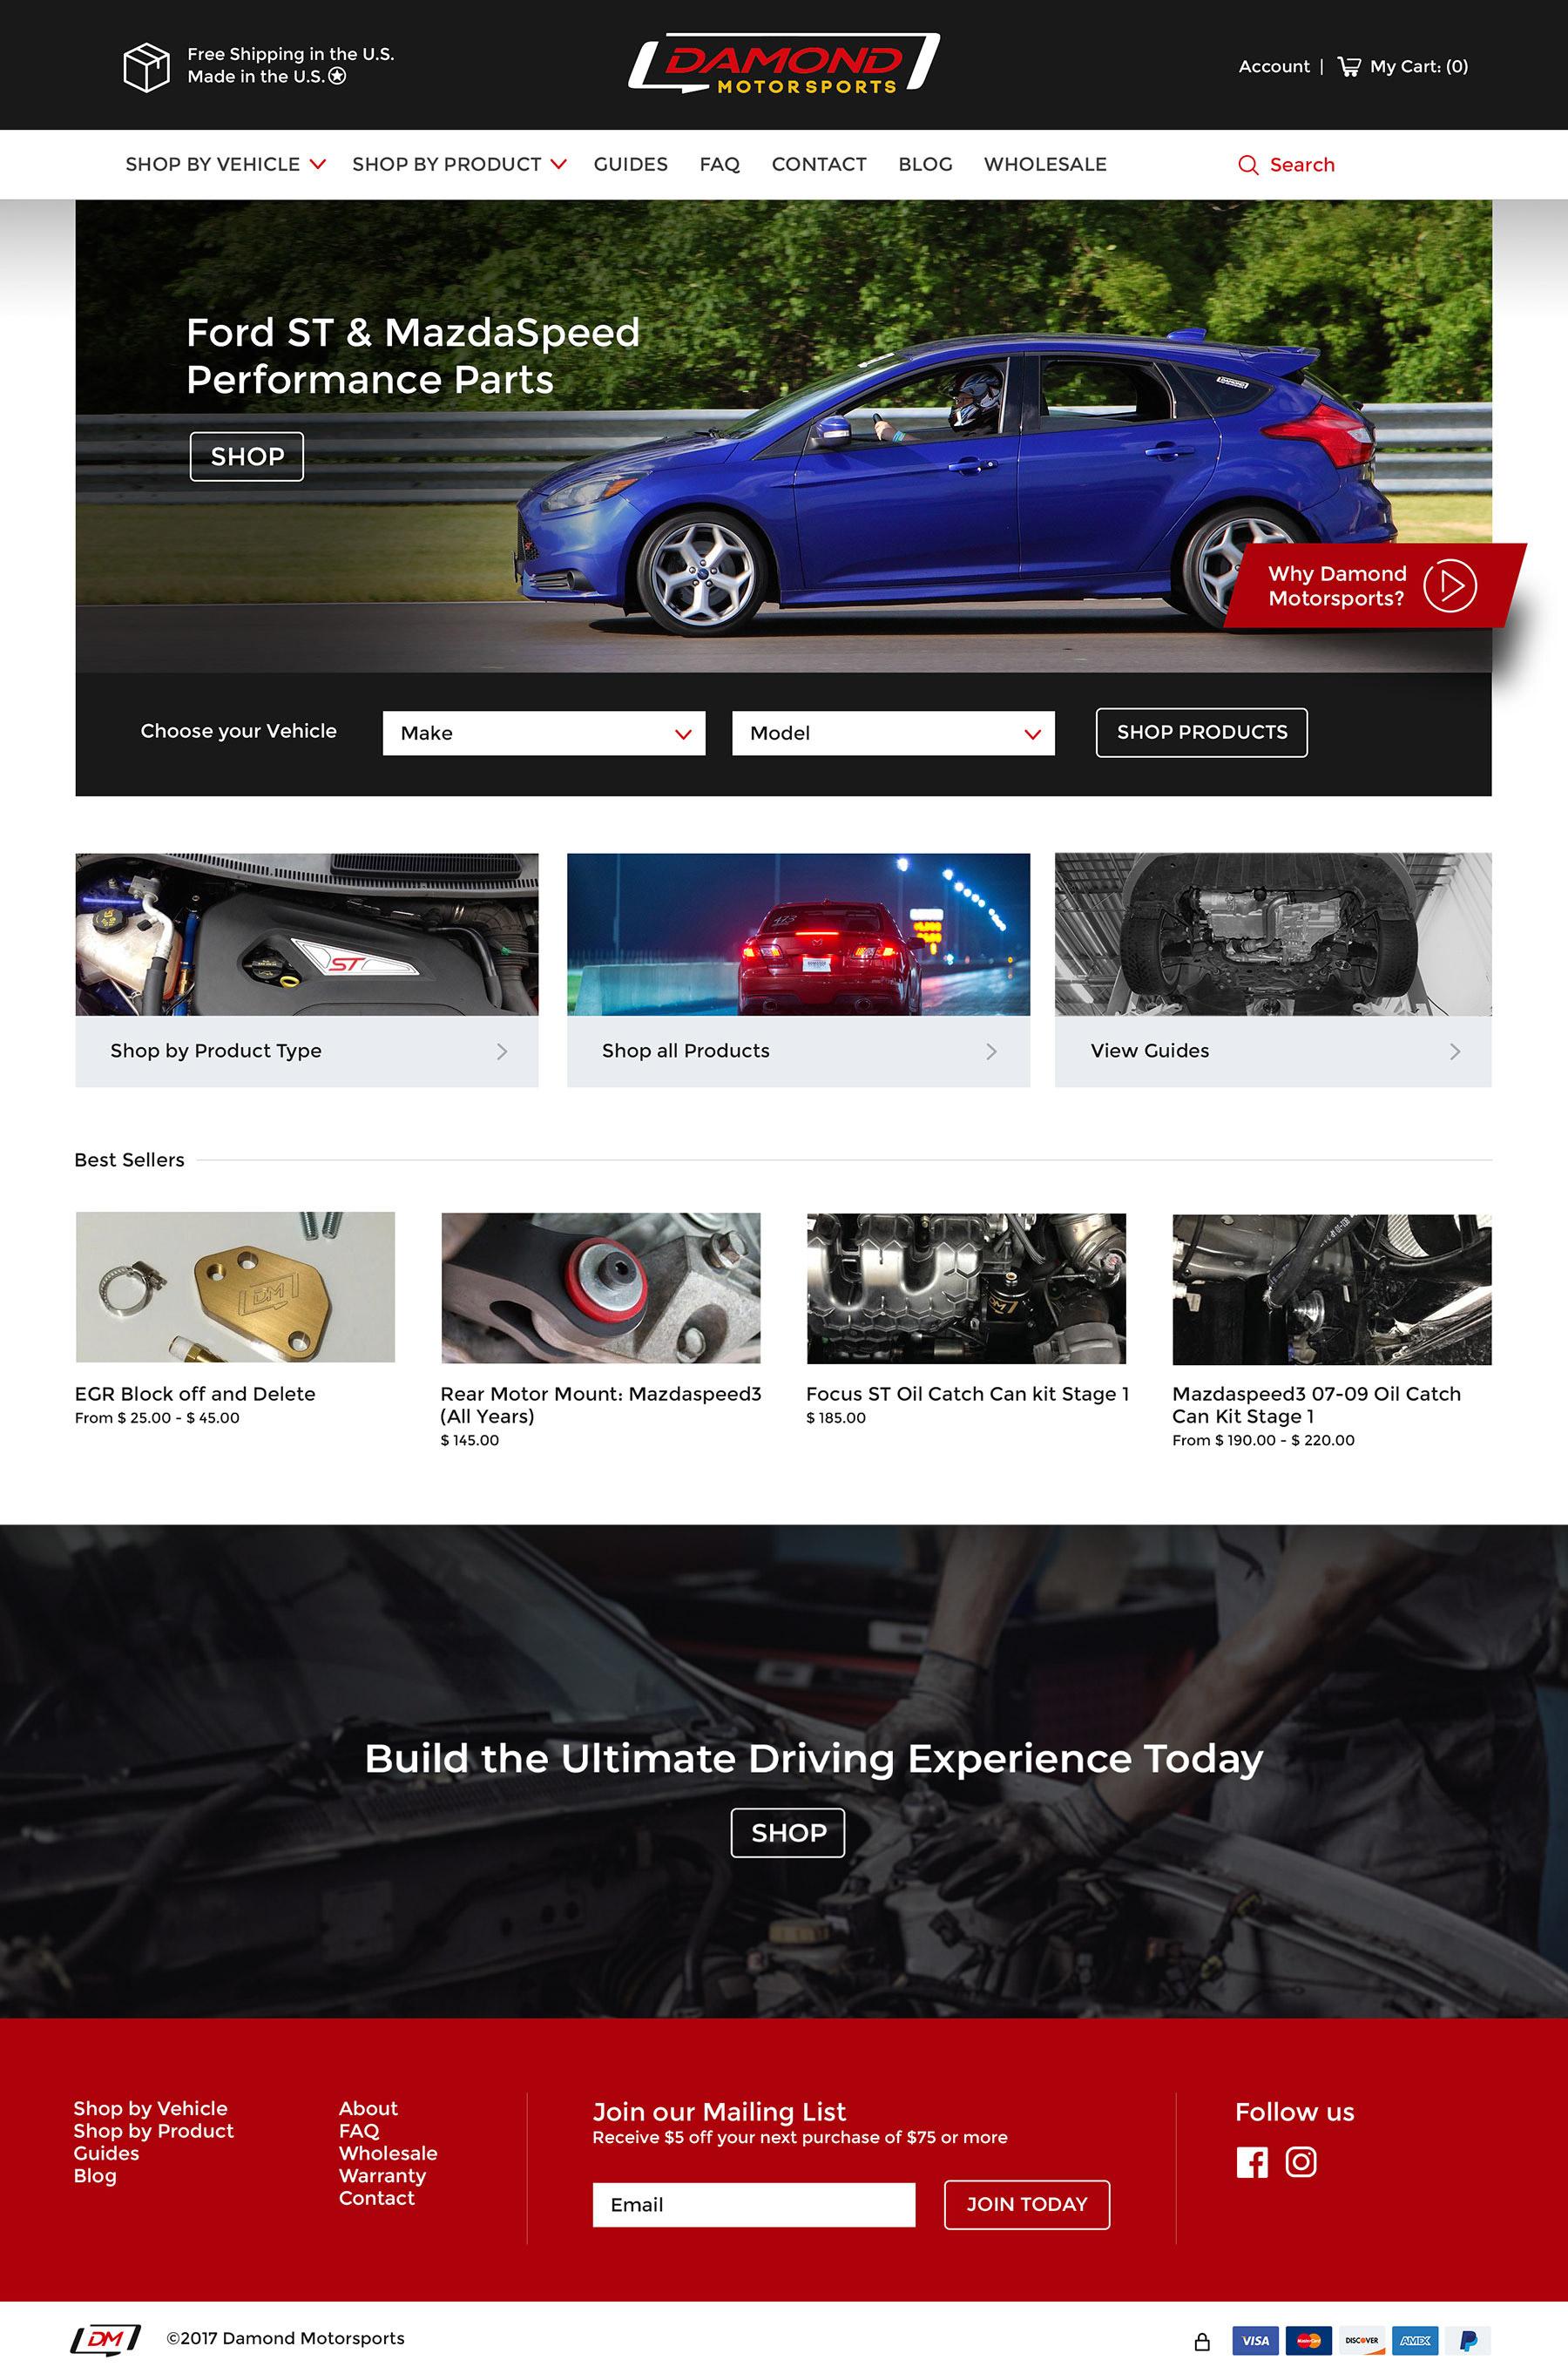 Damond Motorsports Home Page